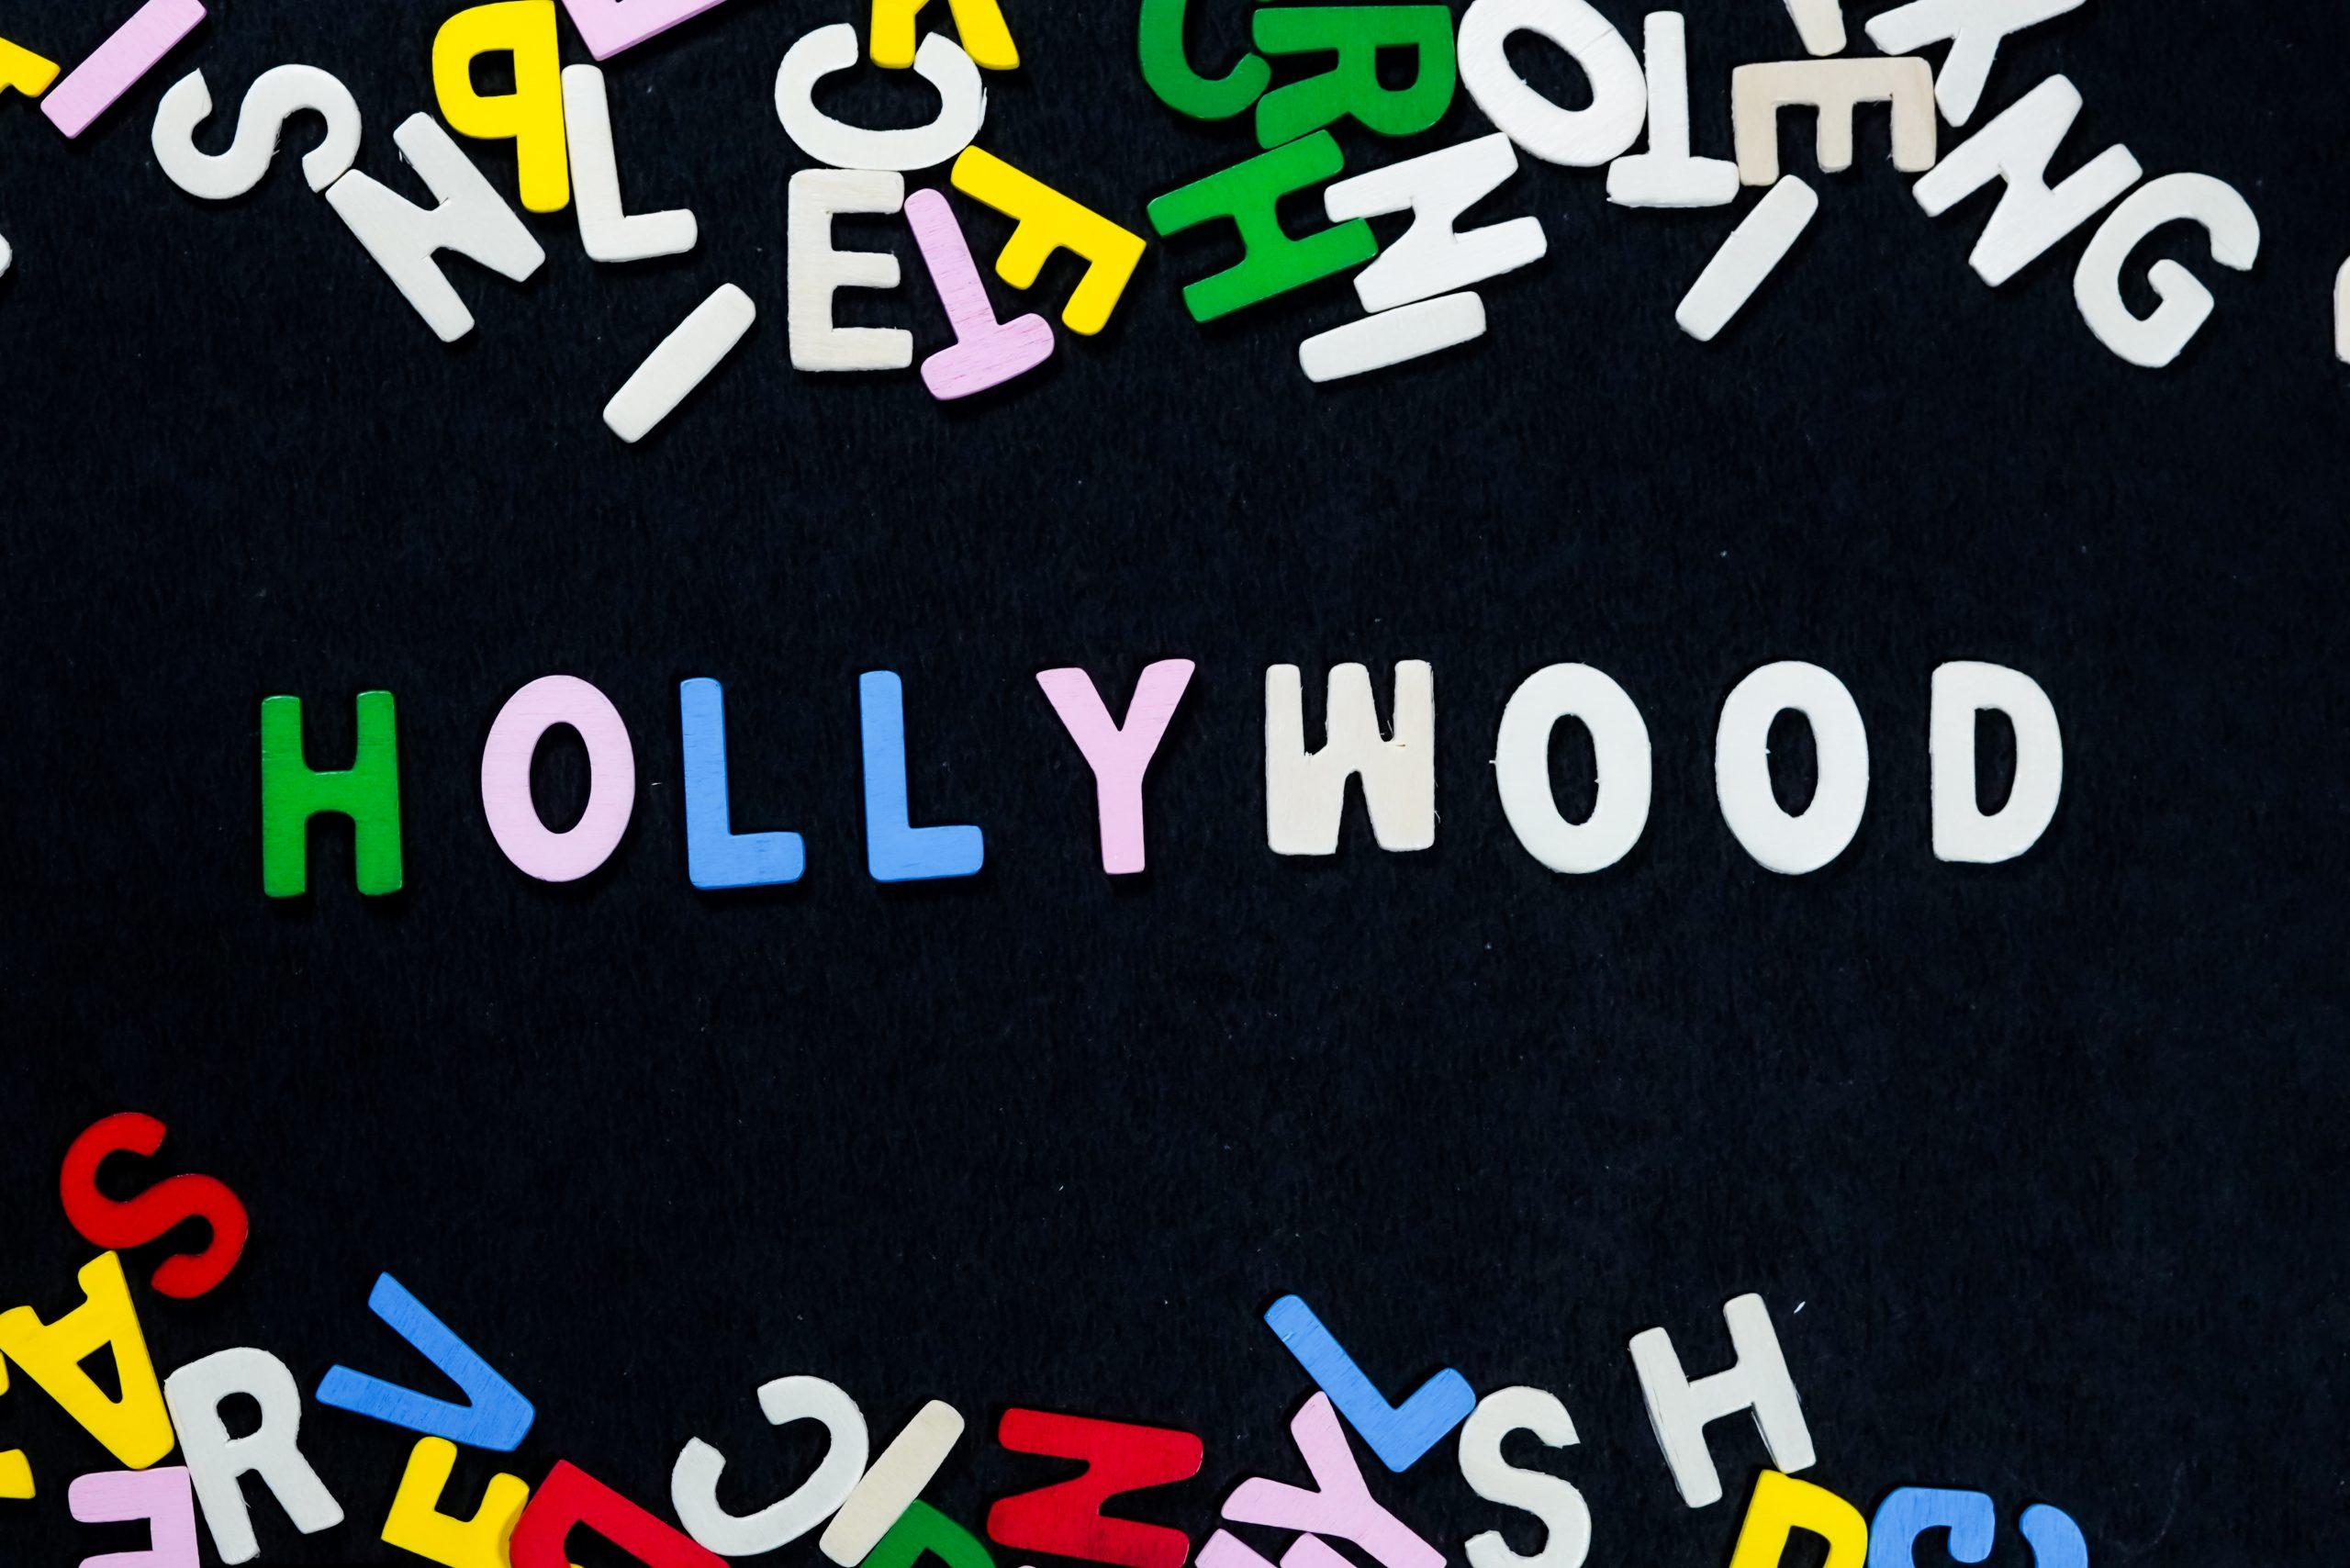 Hollywood words